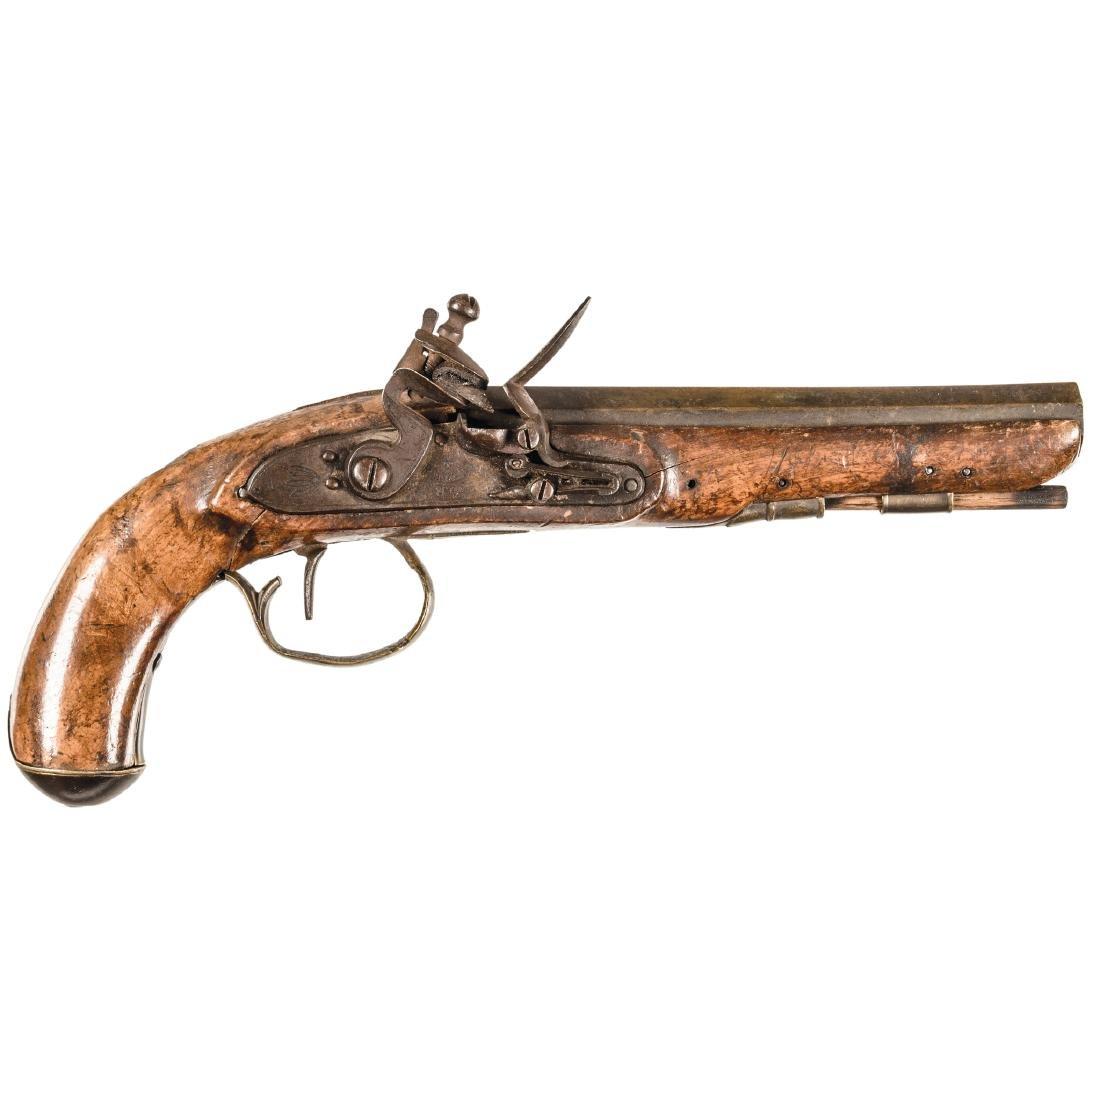 c 1815-30 Nice English/American Flintlock Pistol